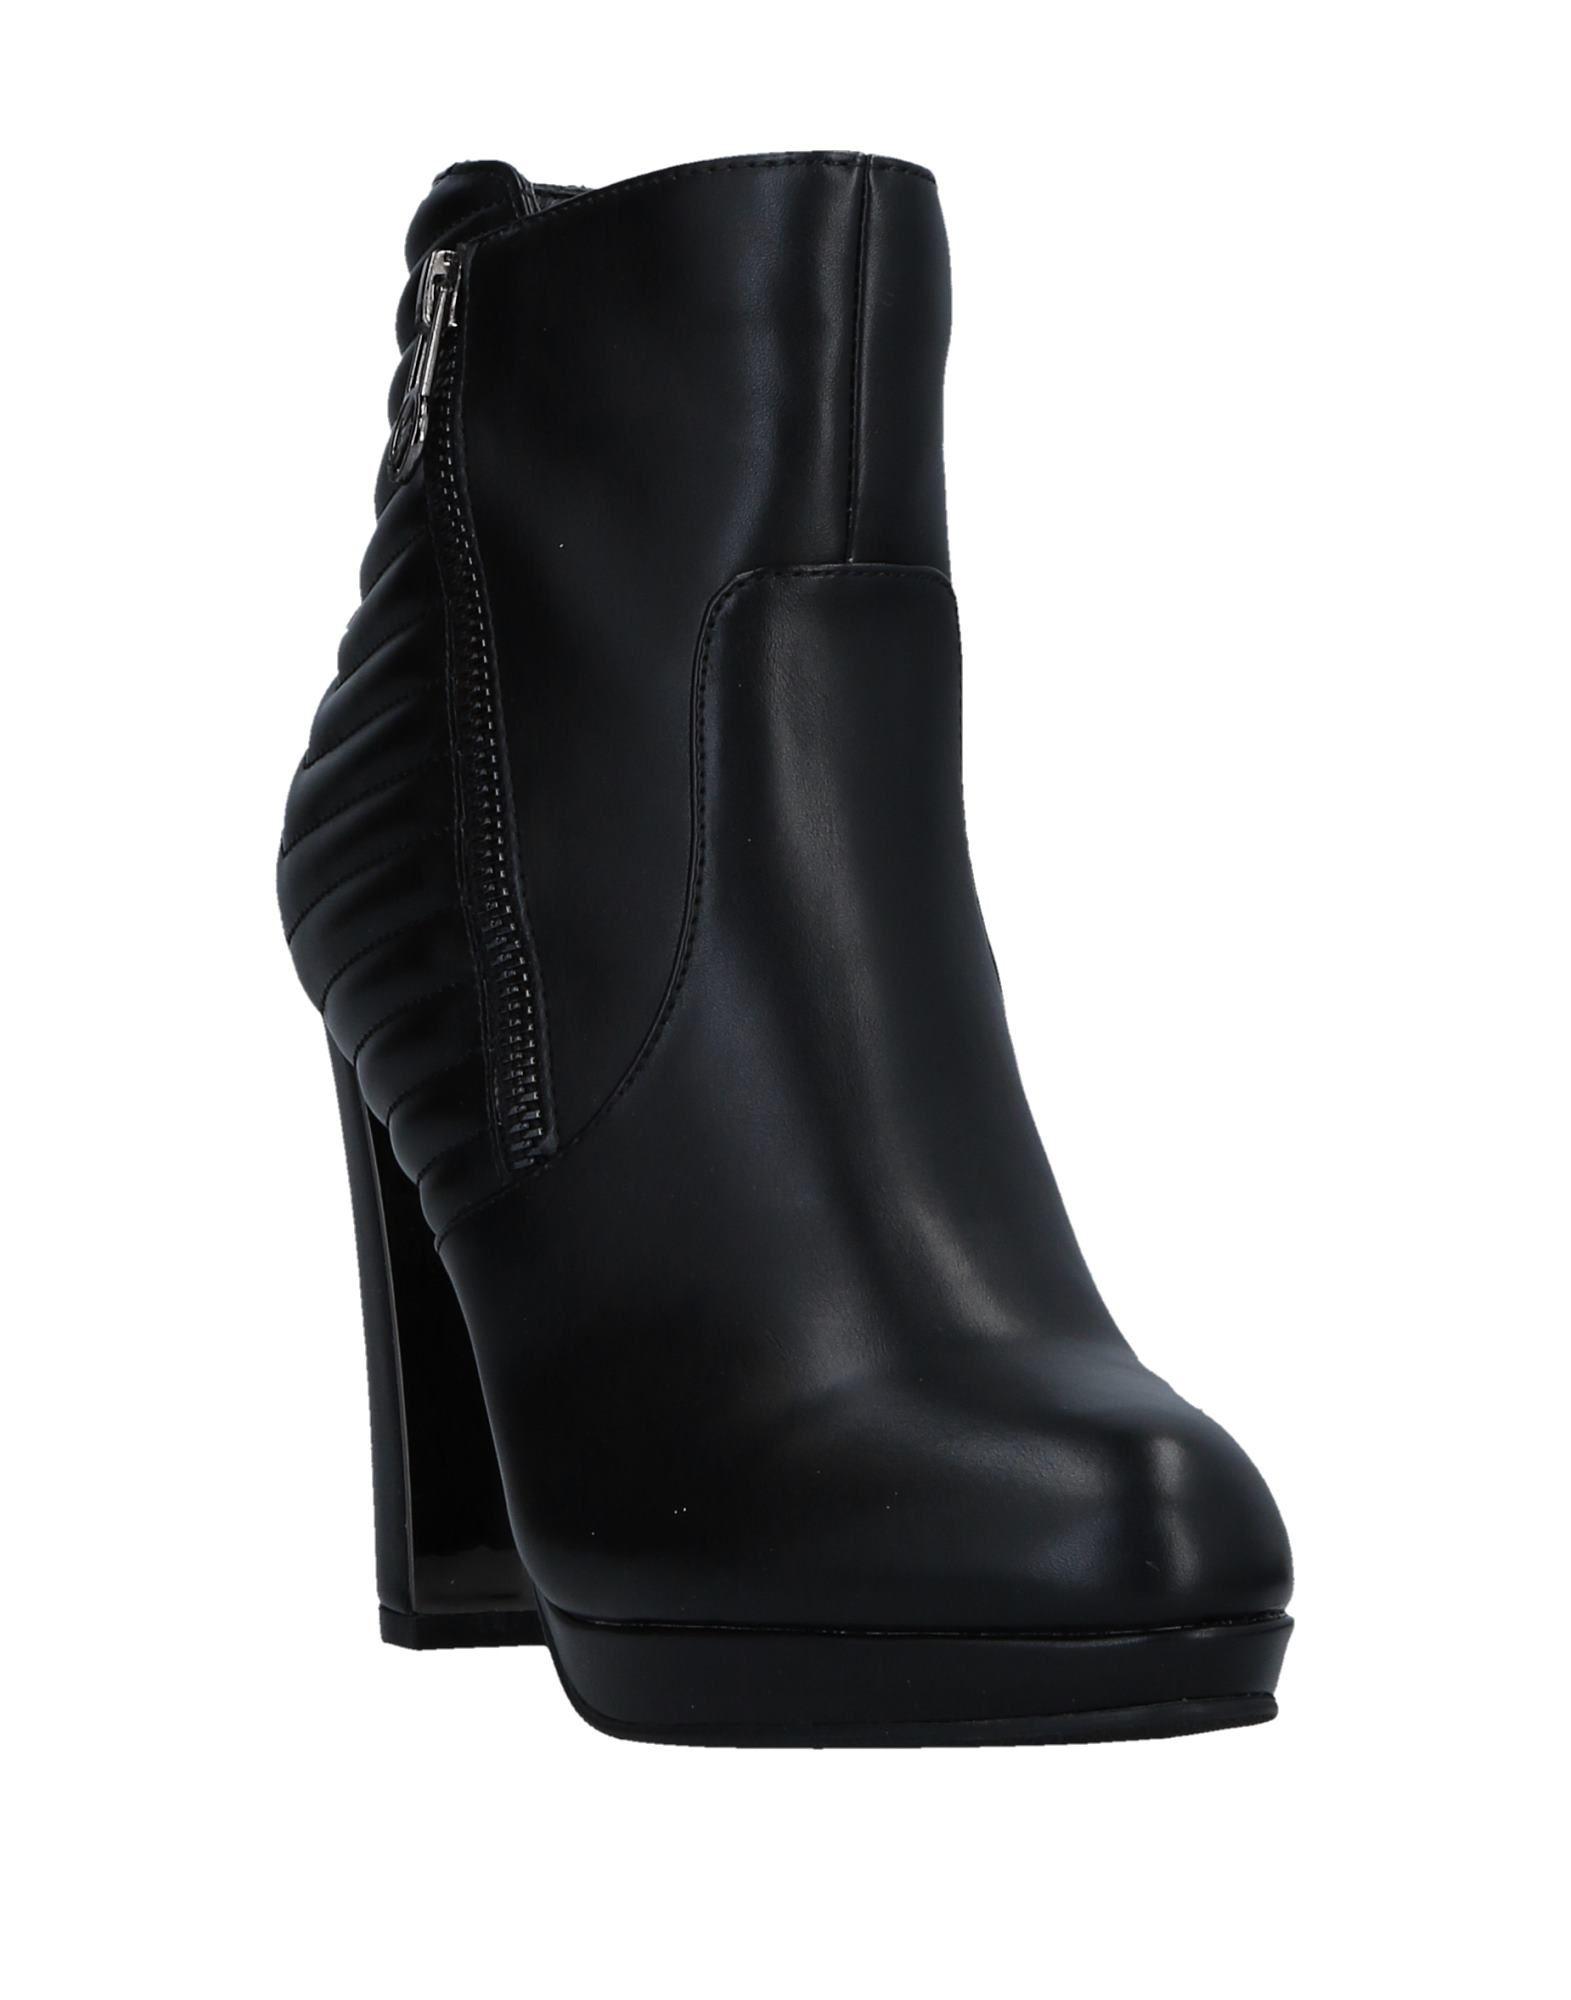 Gattinoni Stiefelette Stiefelette Gattinoni Damen  11517229GF Gute Qualität beliebte Schuhe 4b3d0b